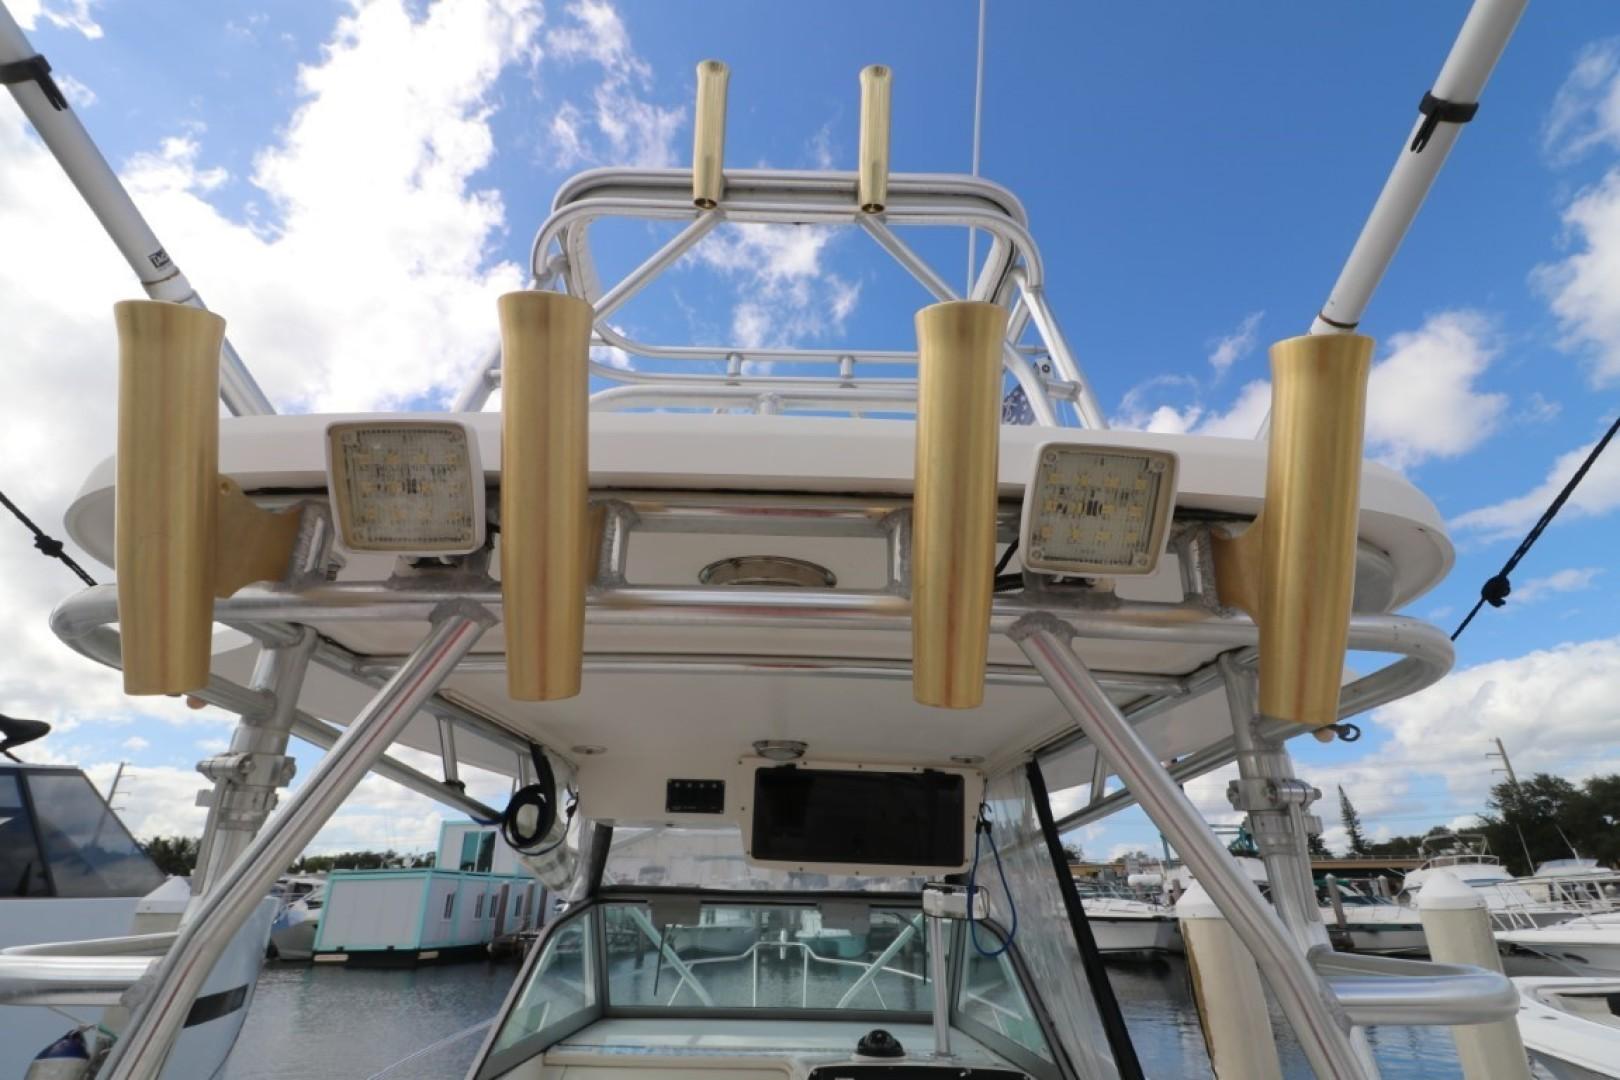 Boston Whaler-280 Outrage 2001 -Fort Lauderdale-Florida-United States-1566101 | Thumbnail